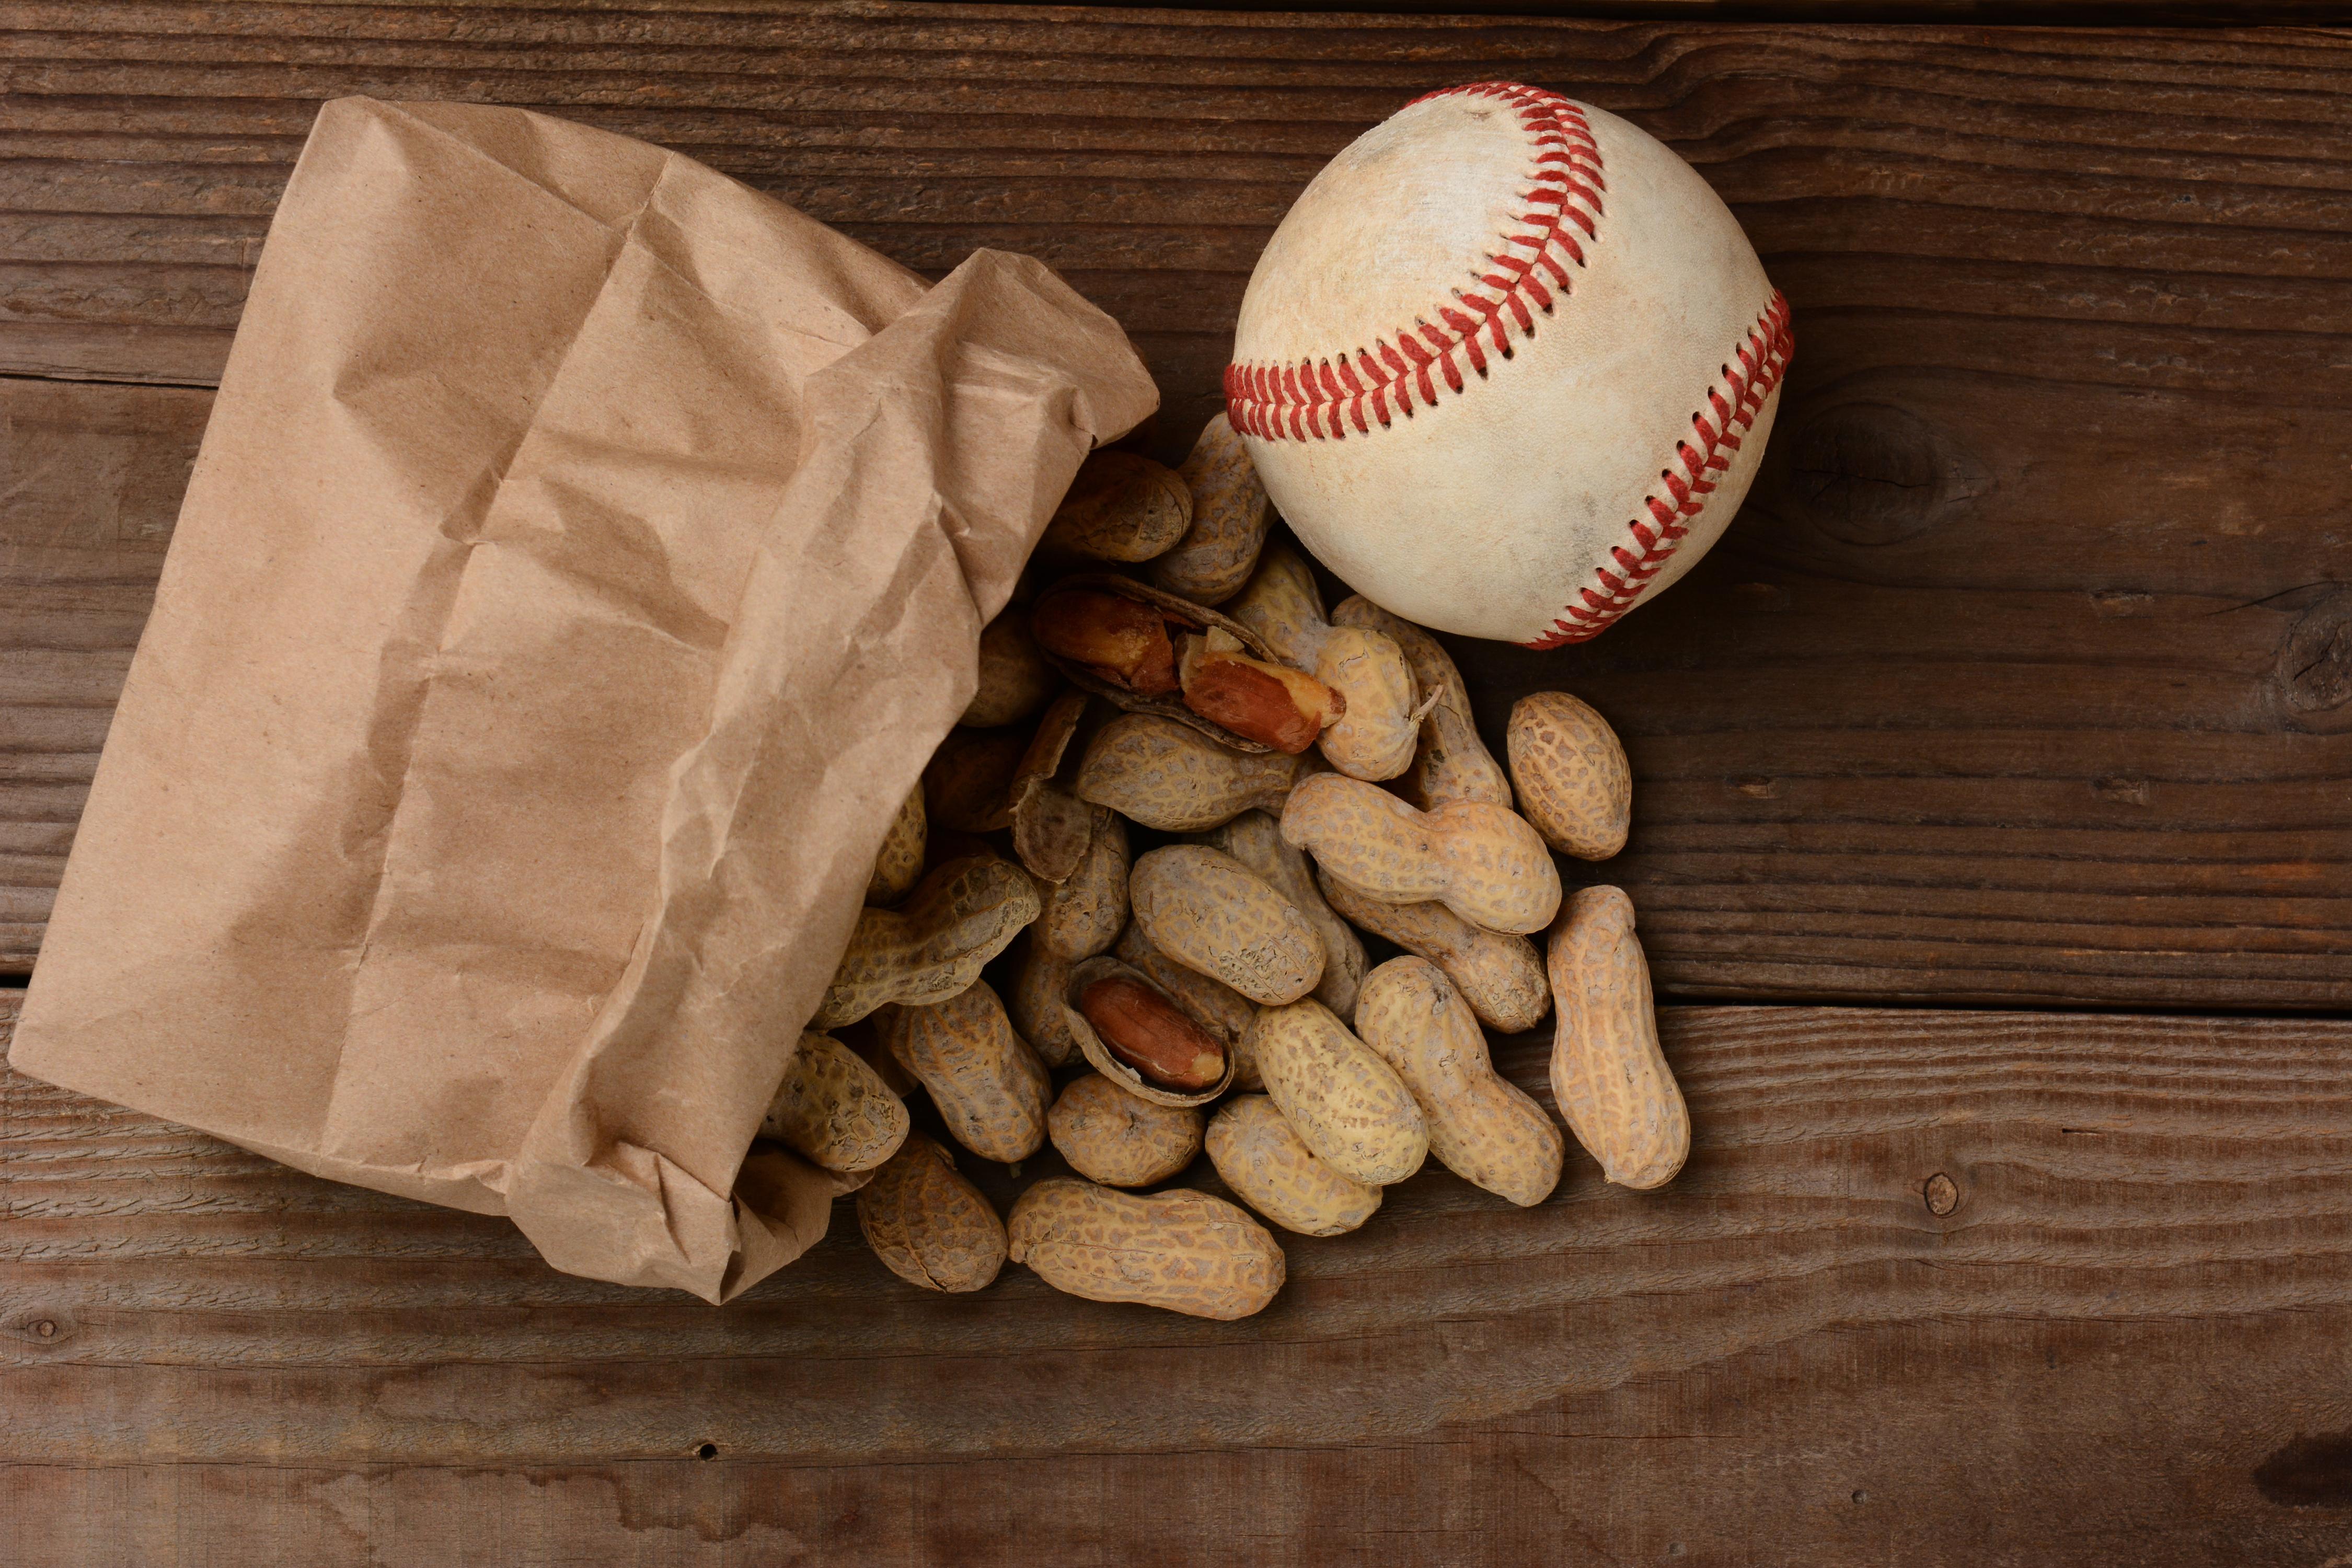 Minor League Baseball team bans peanuts from stadium